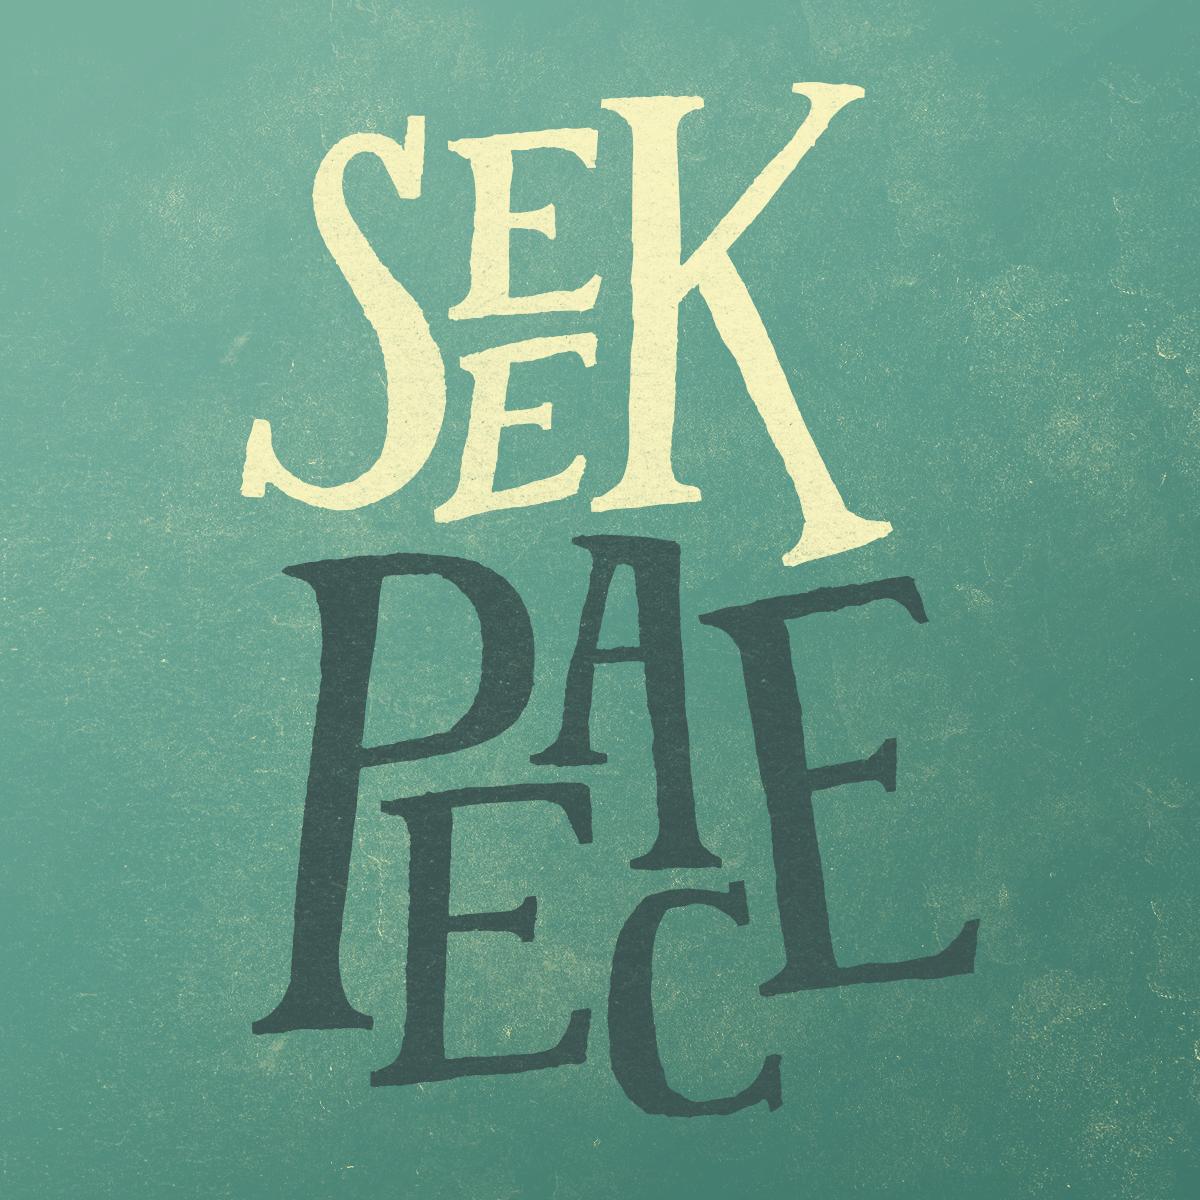 FL-Keyboard_Jim-LePage_Seek-peace.png